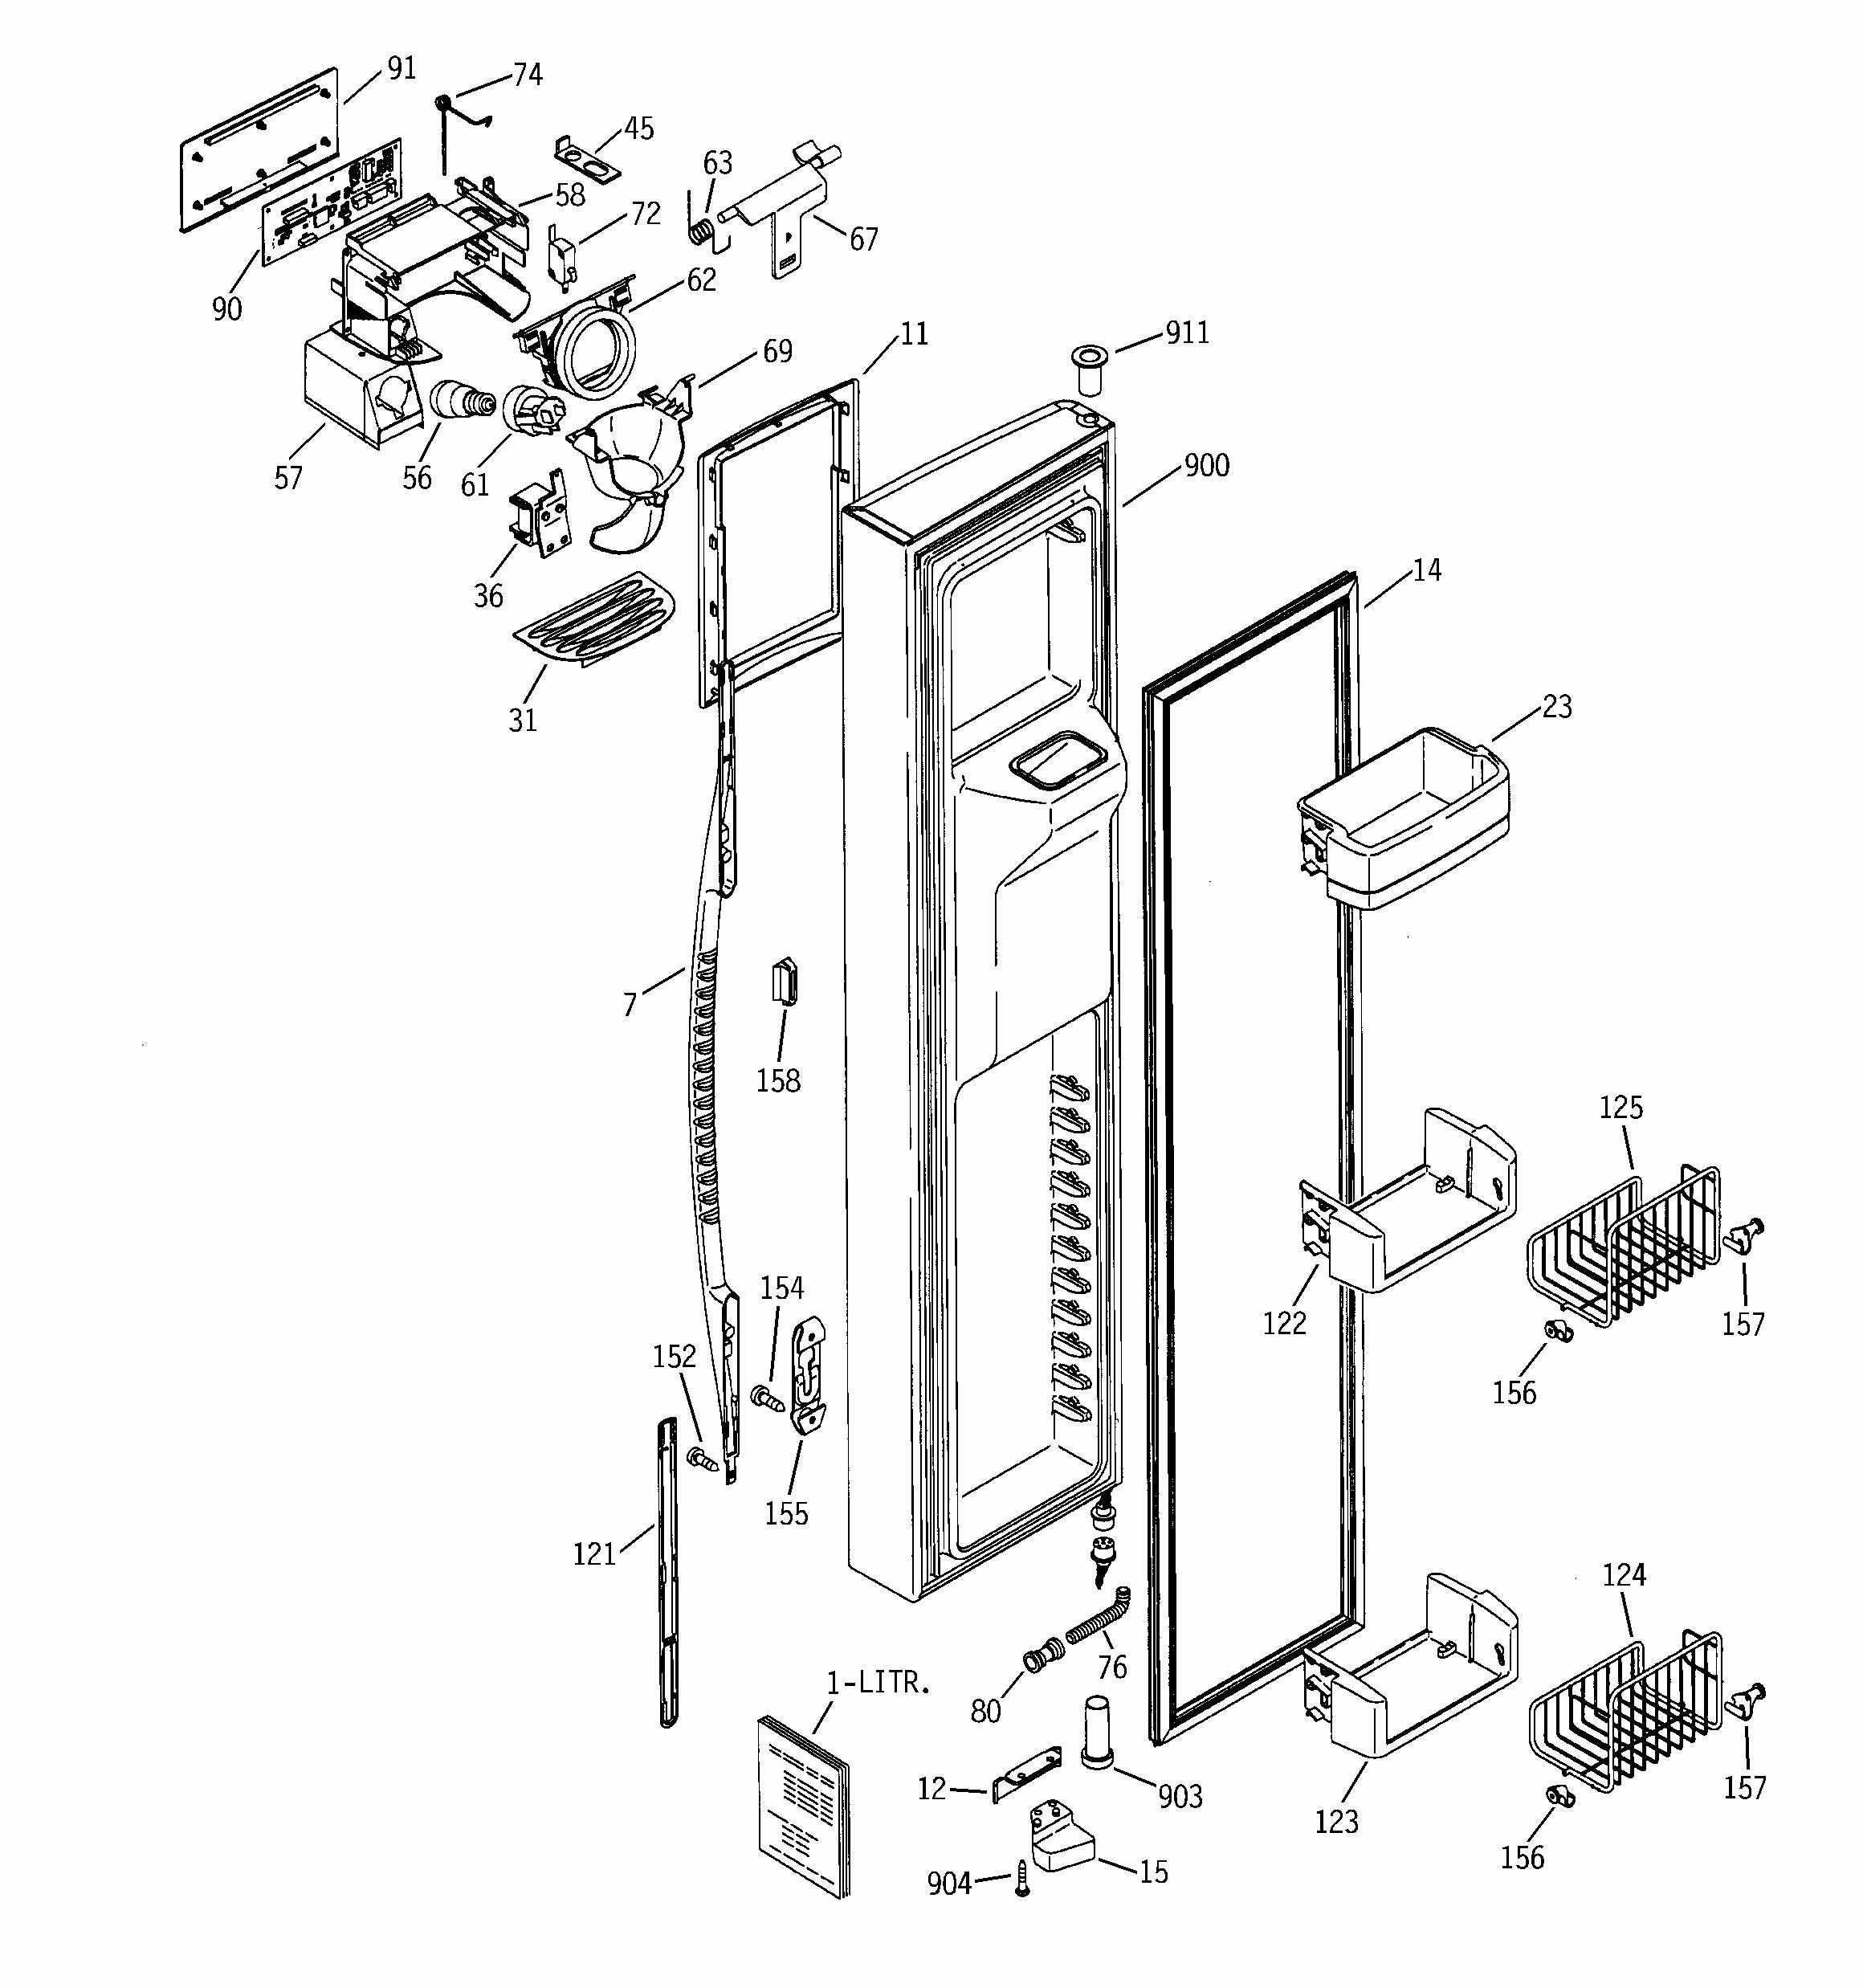 Whirlpool Gold Refrigerator Wiring Diagram - Trusted Wiring Diagram - Whirlpool Refrigerator Wiring Diagram